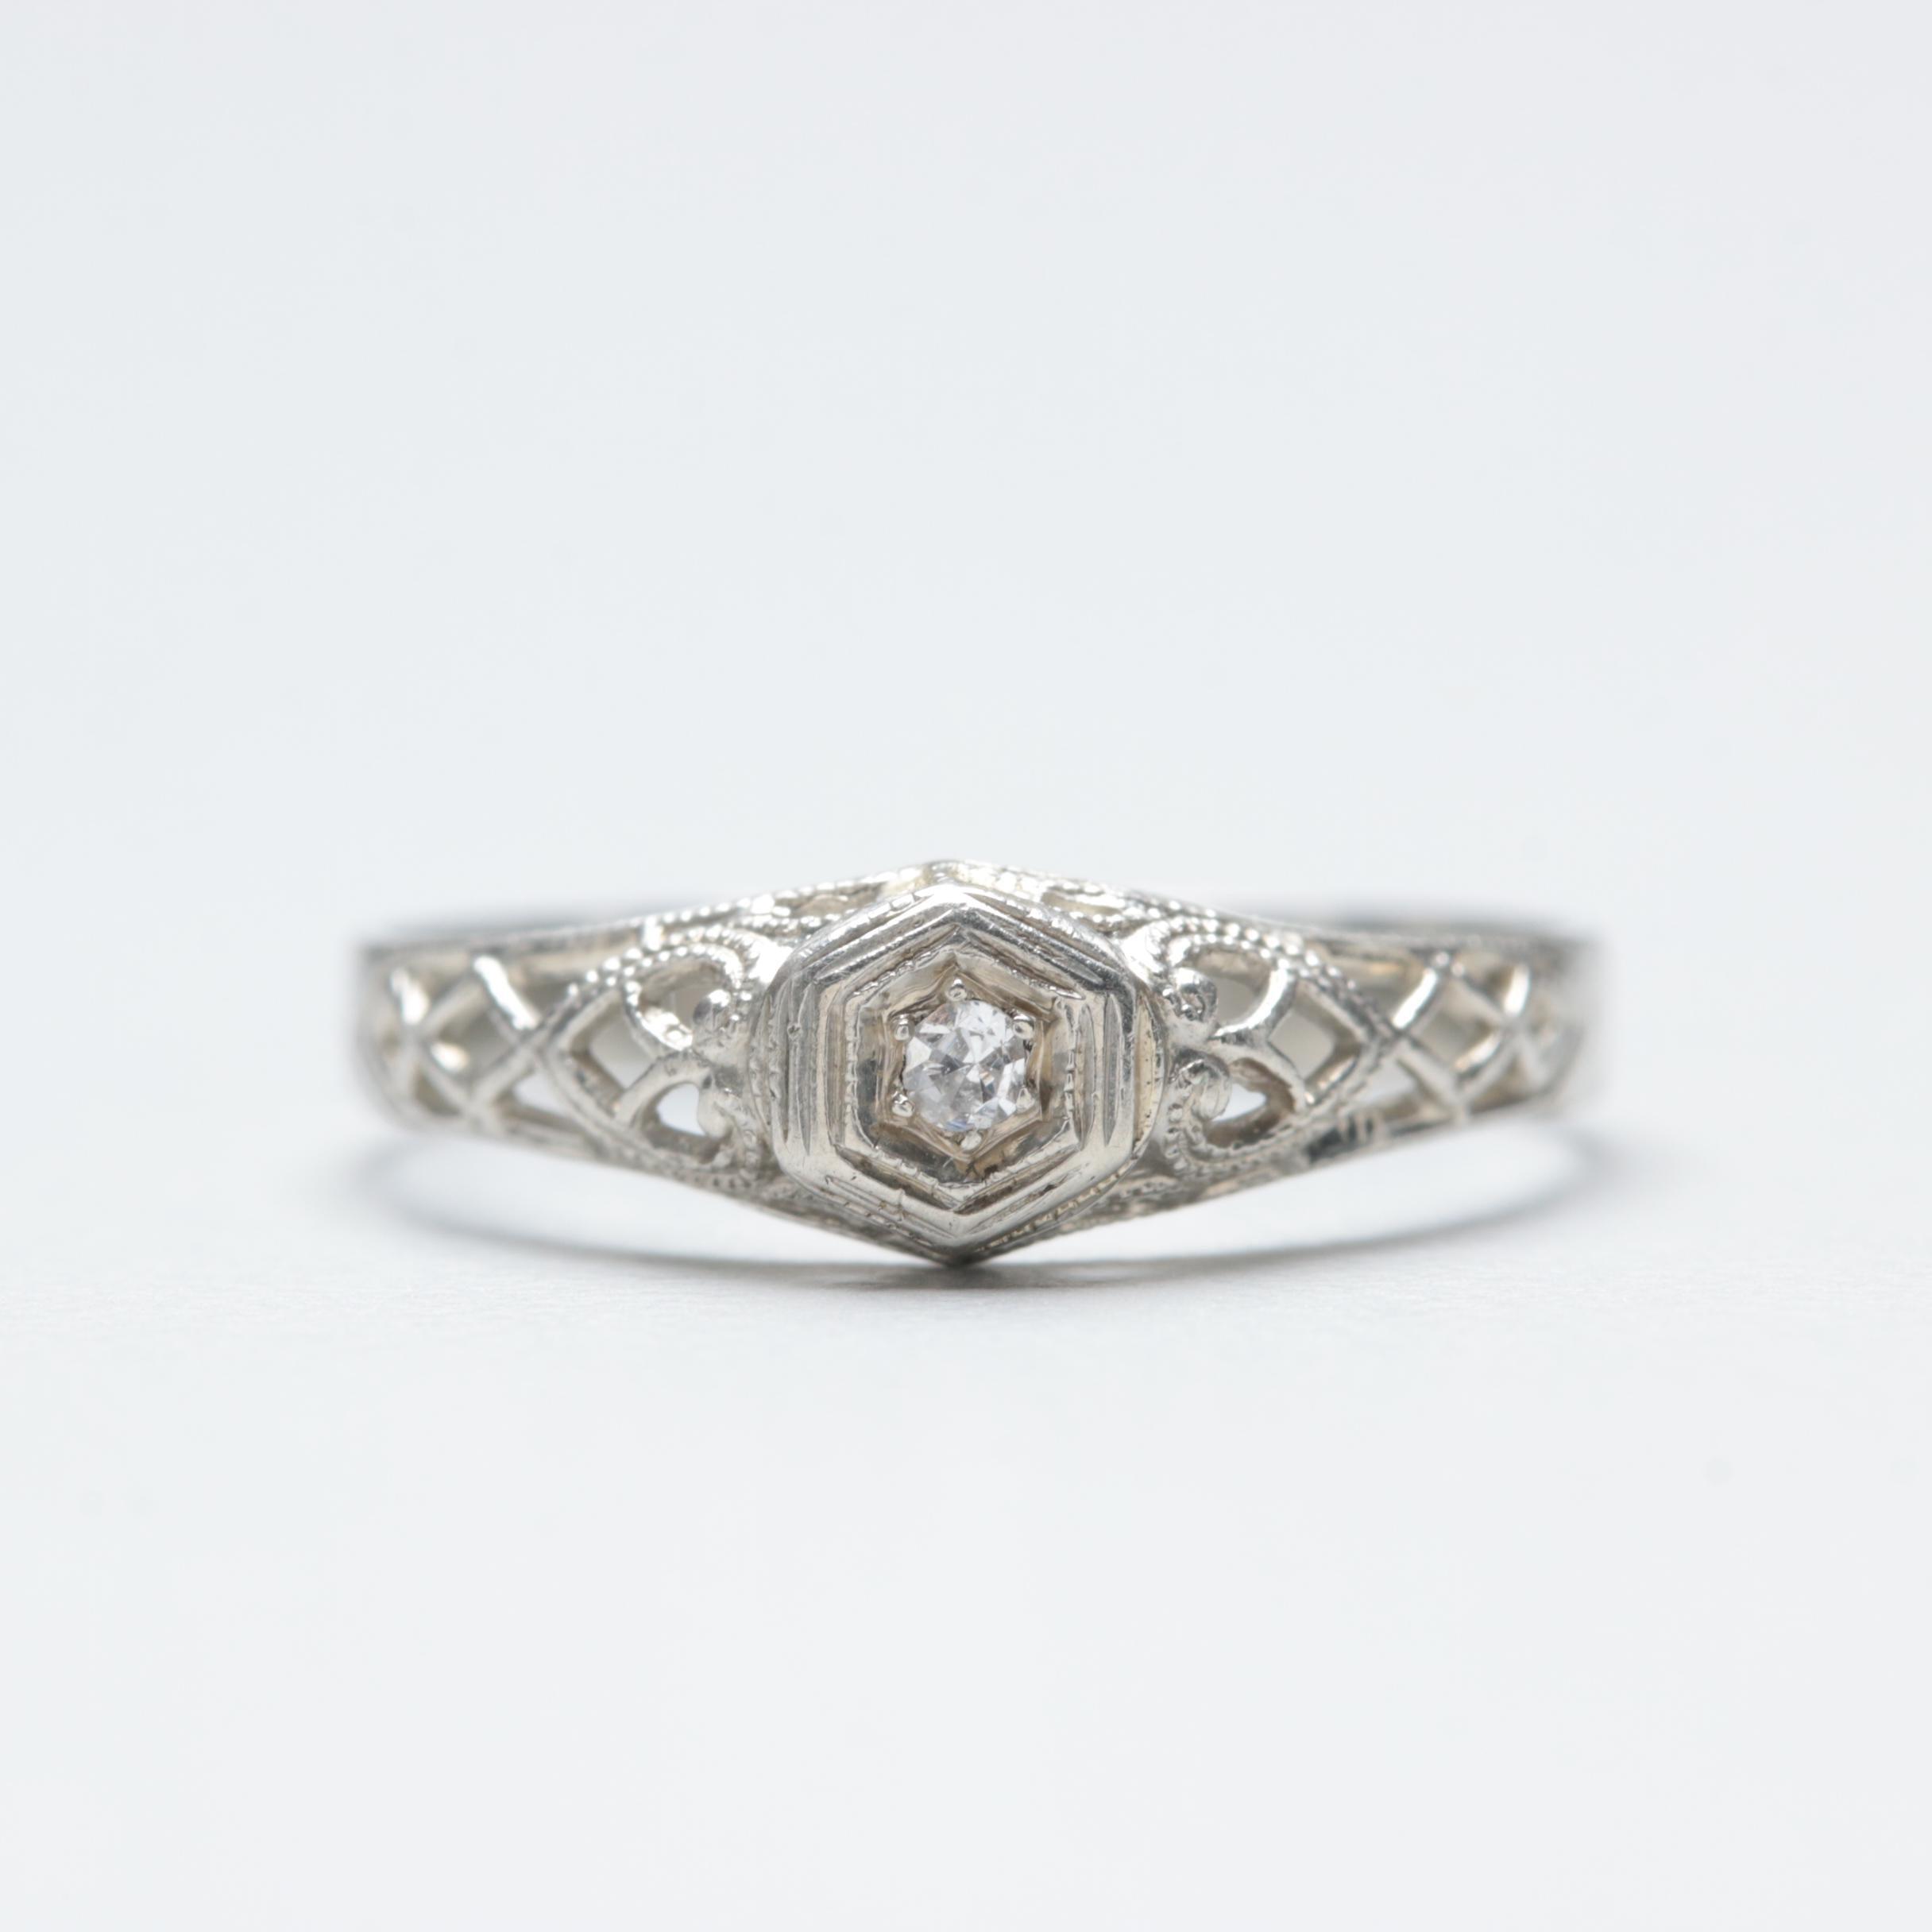 18K White Gold Diamond Solitaire Openwork Ring